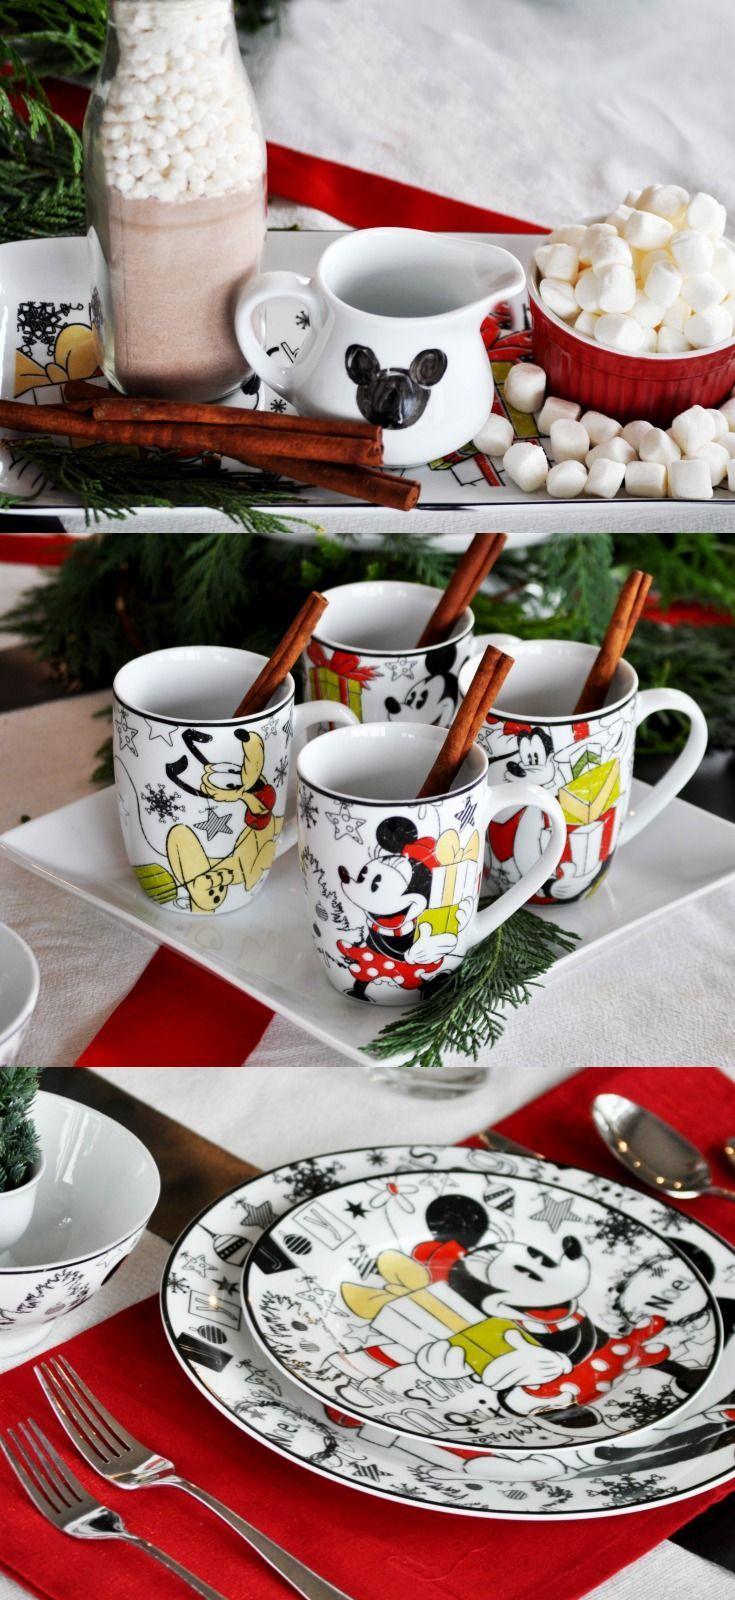 Disney holiday table setting. Cute Christmas breakfast decor!